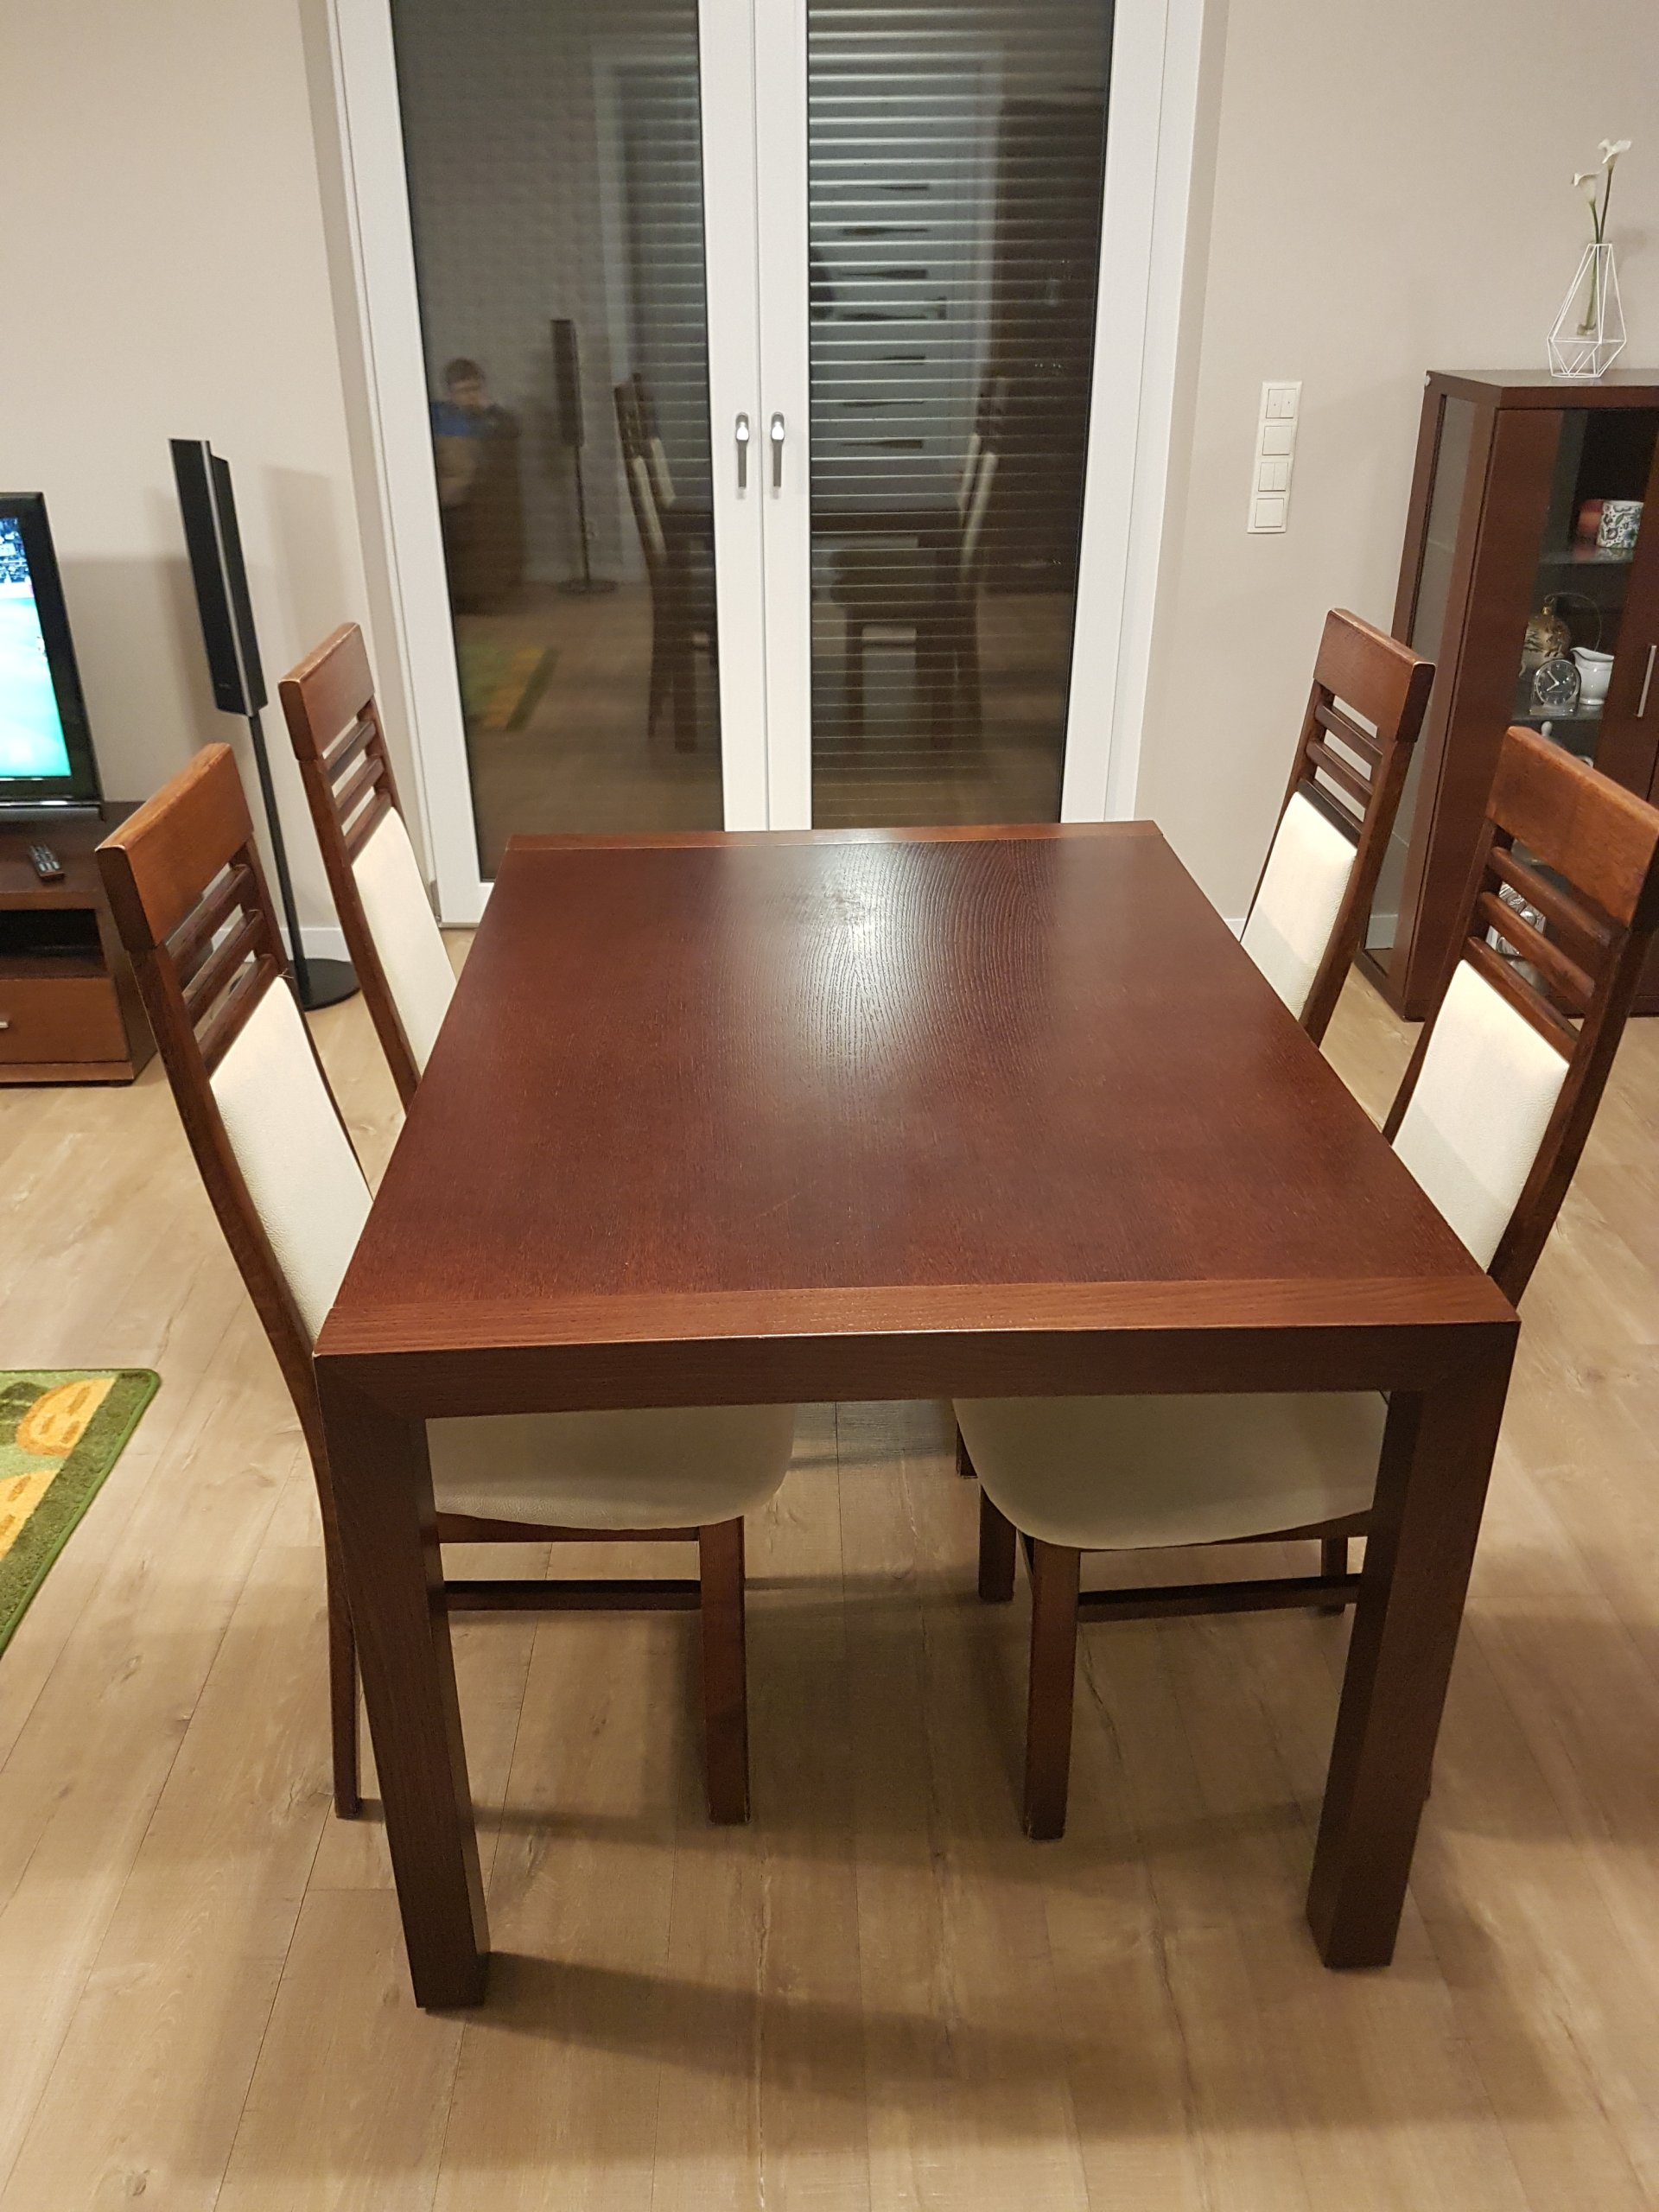 Stół 4 Krzesła Komplet Bydgoskie Meble 7210879251